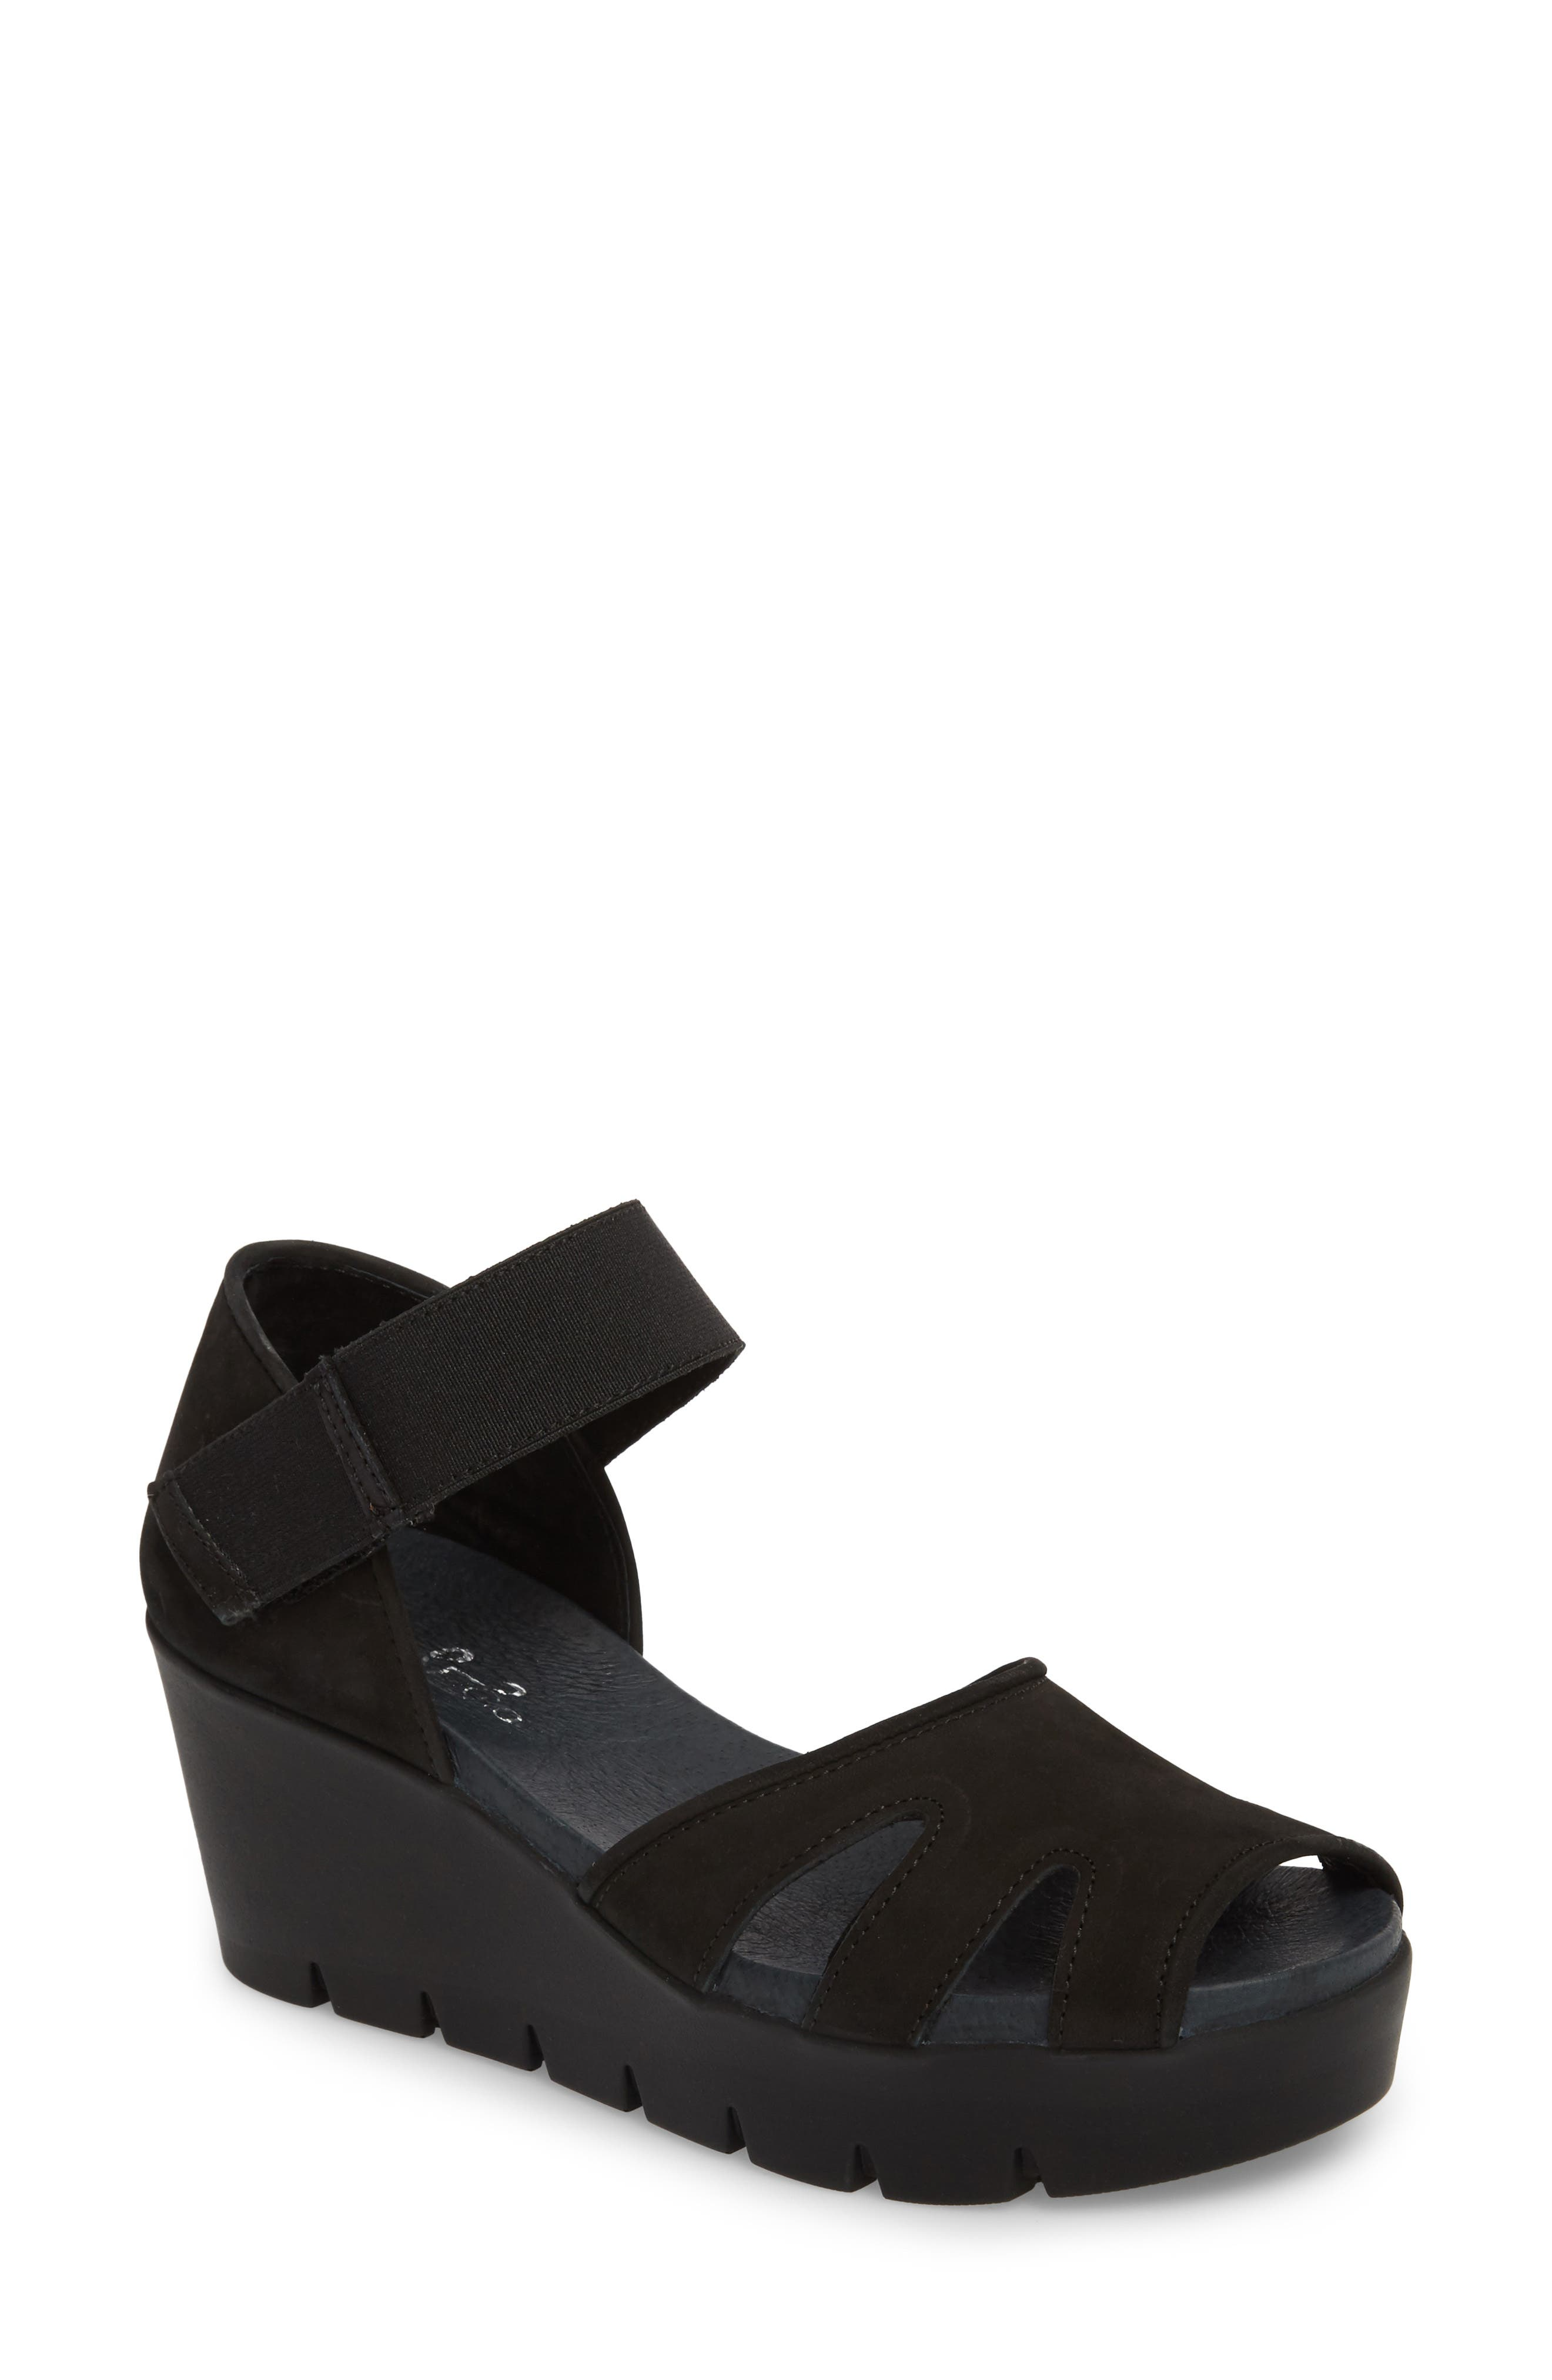 a11f2c8b9a73c Bos. & Co. Sharon Platform Wedge Sandal - Black